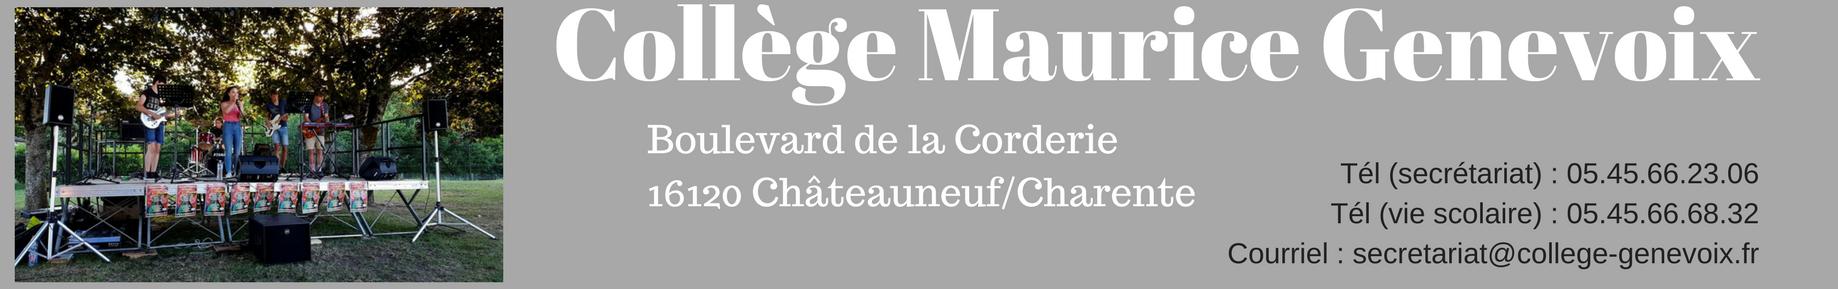 Collège Maurice Genevoix